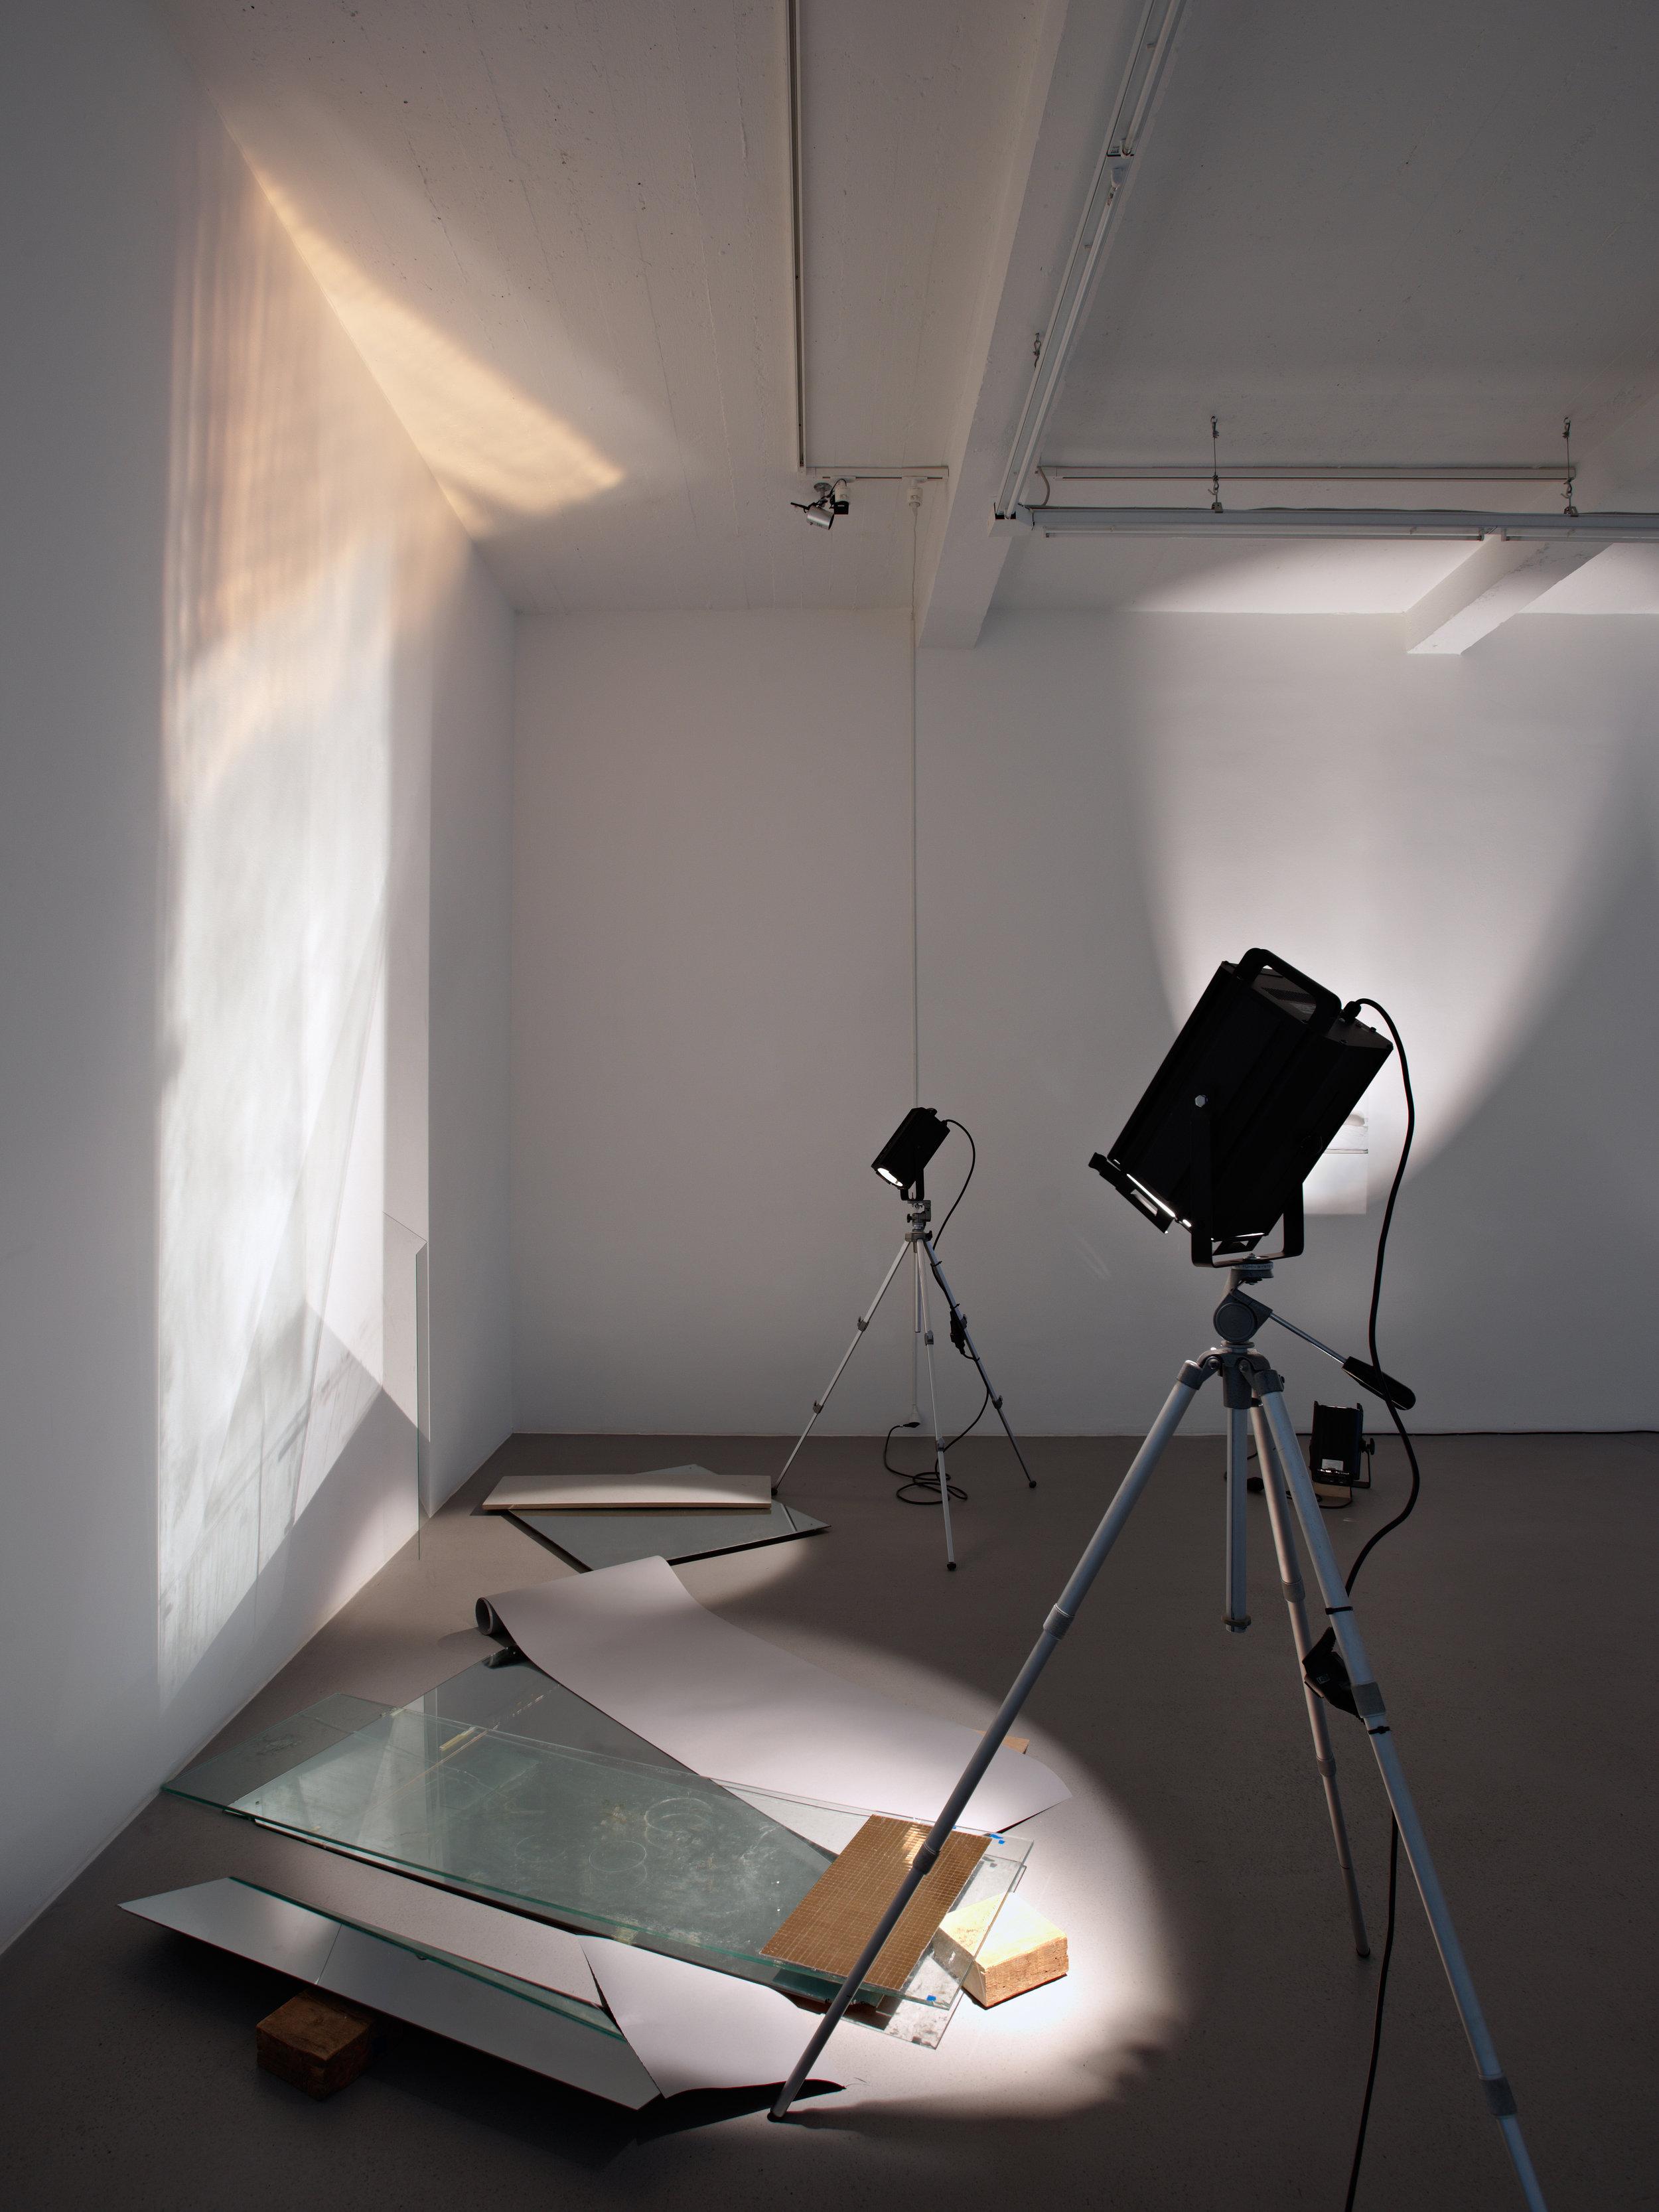 Roos van Haaften and Romain Cadilhon @ Galerie Conrads, Dusseldorf | 2017